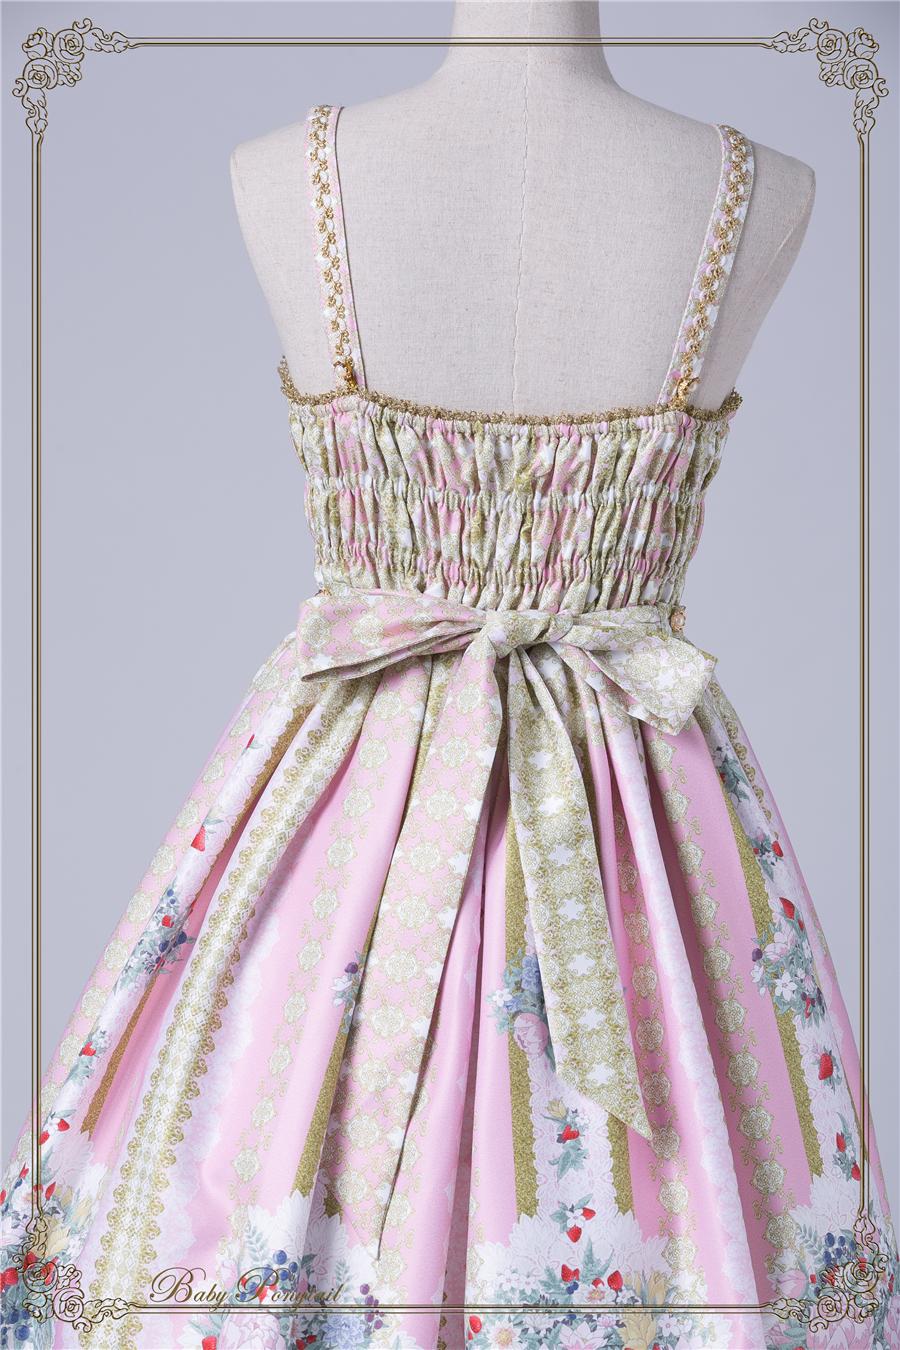 Baby Ponytail_Stock Photo_Rococo Bouquet_JSK Pink_0.jpg